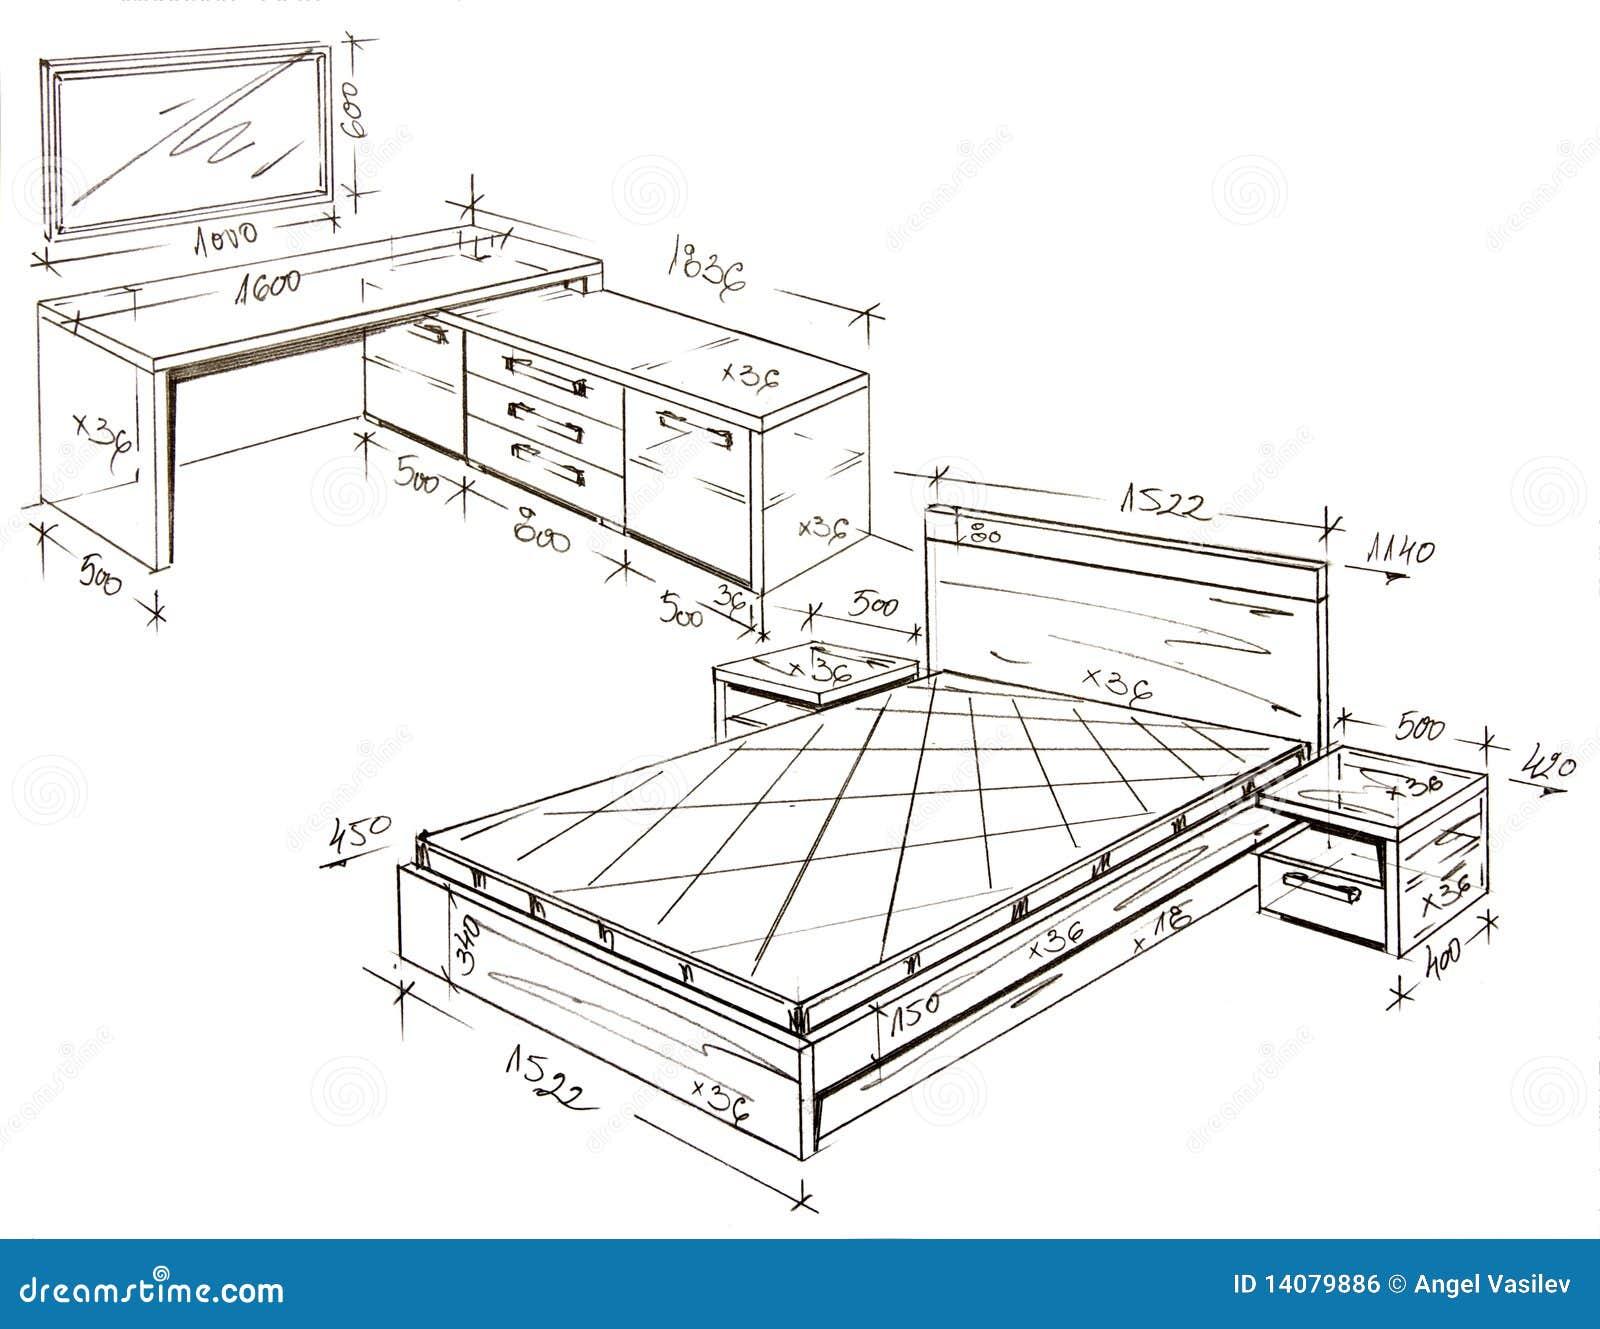 Modern interior design freehand drawing royalty free for Interior designs drawings